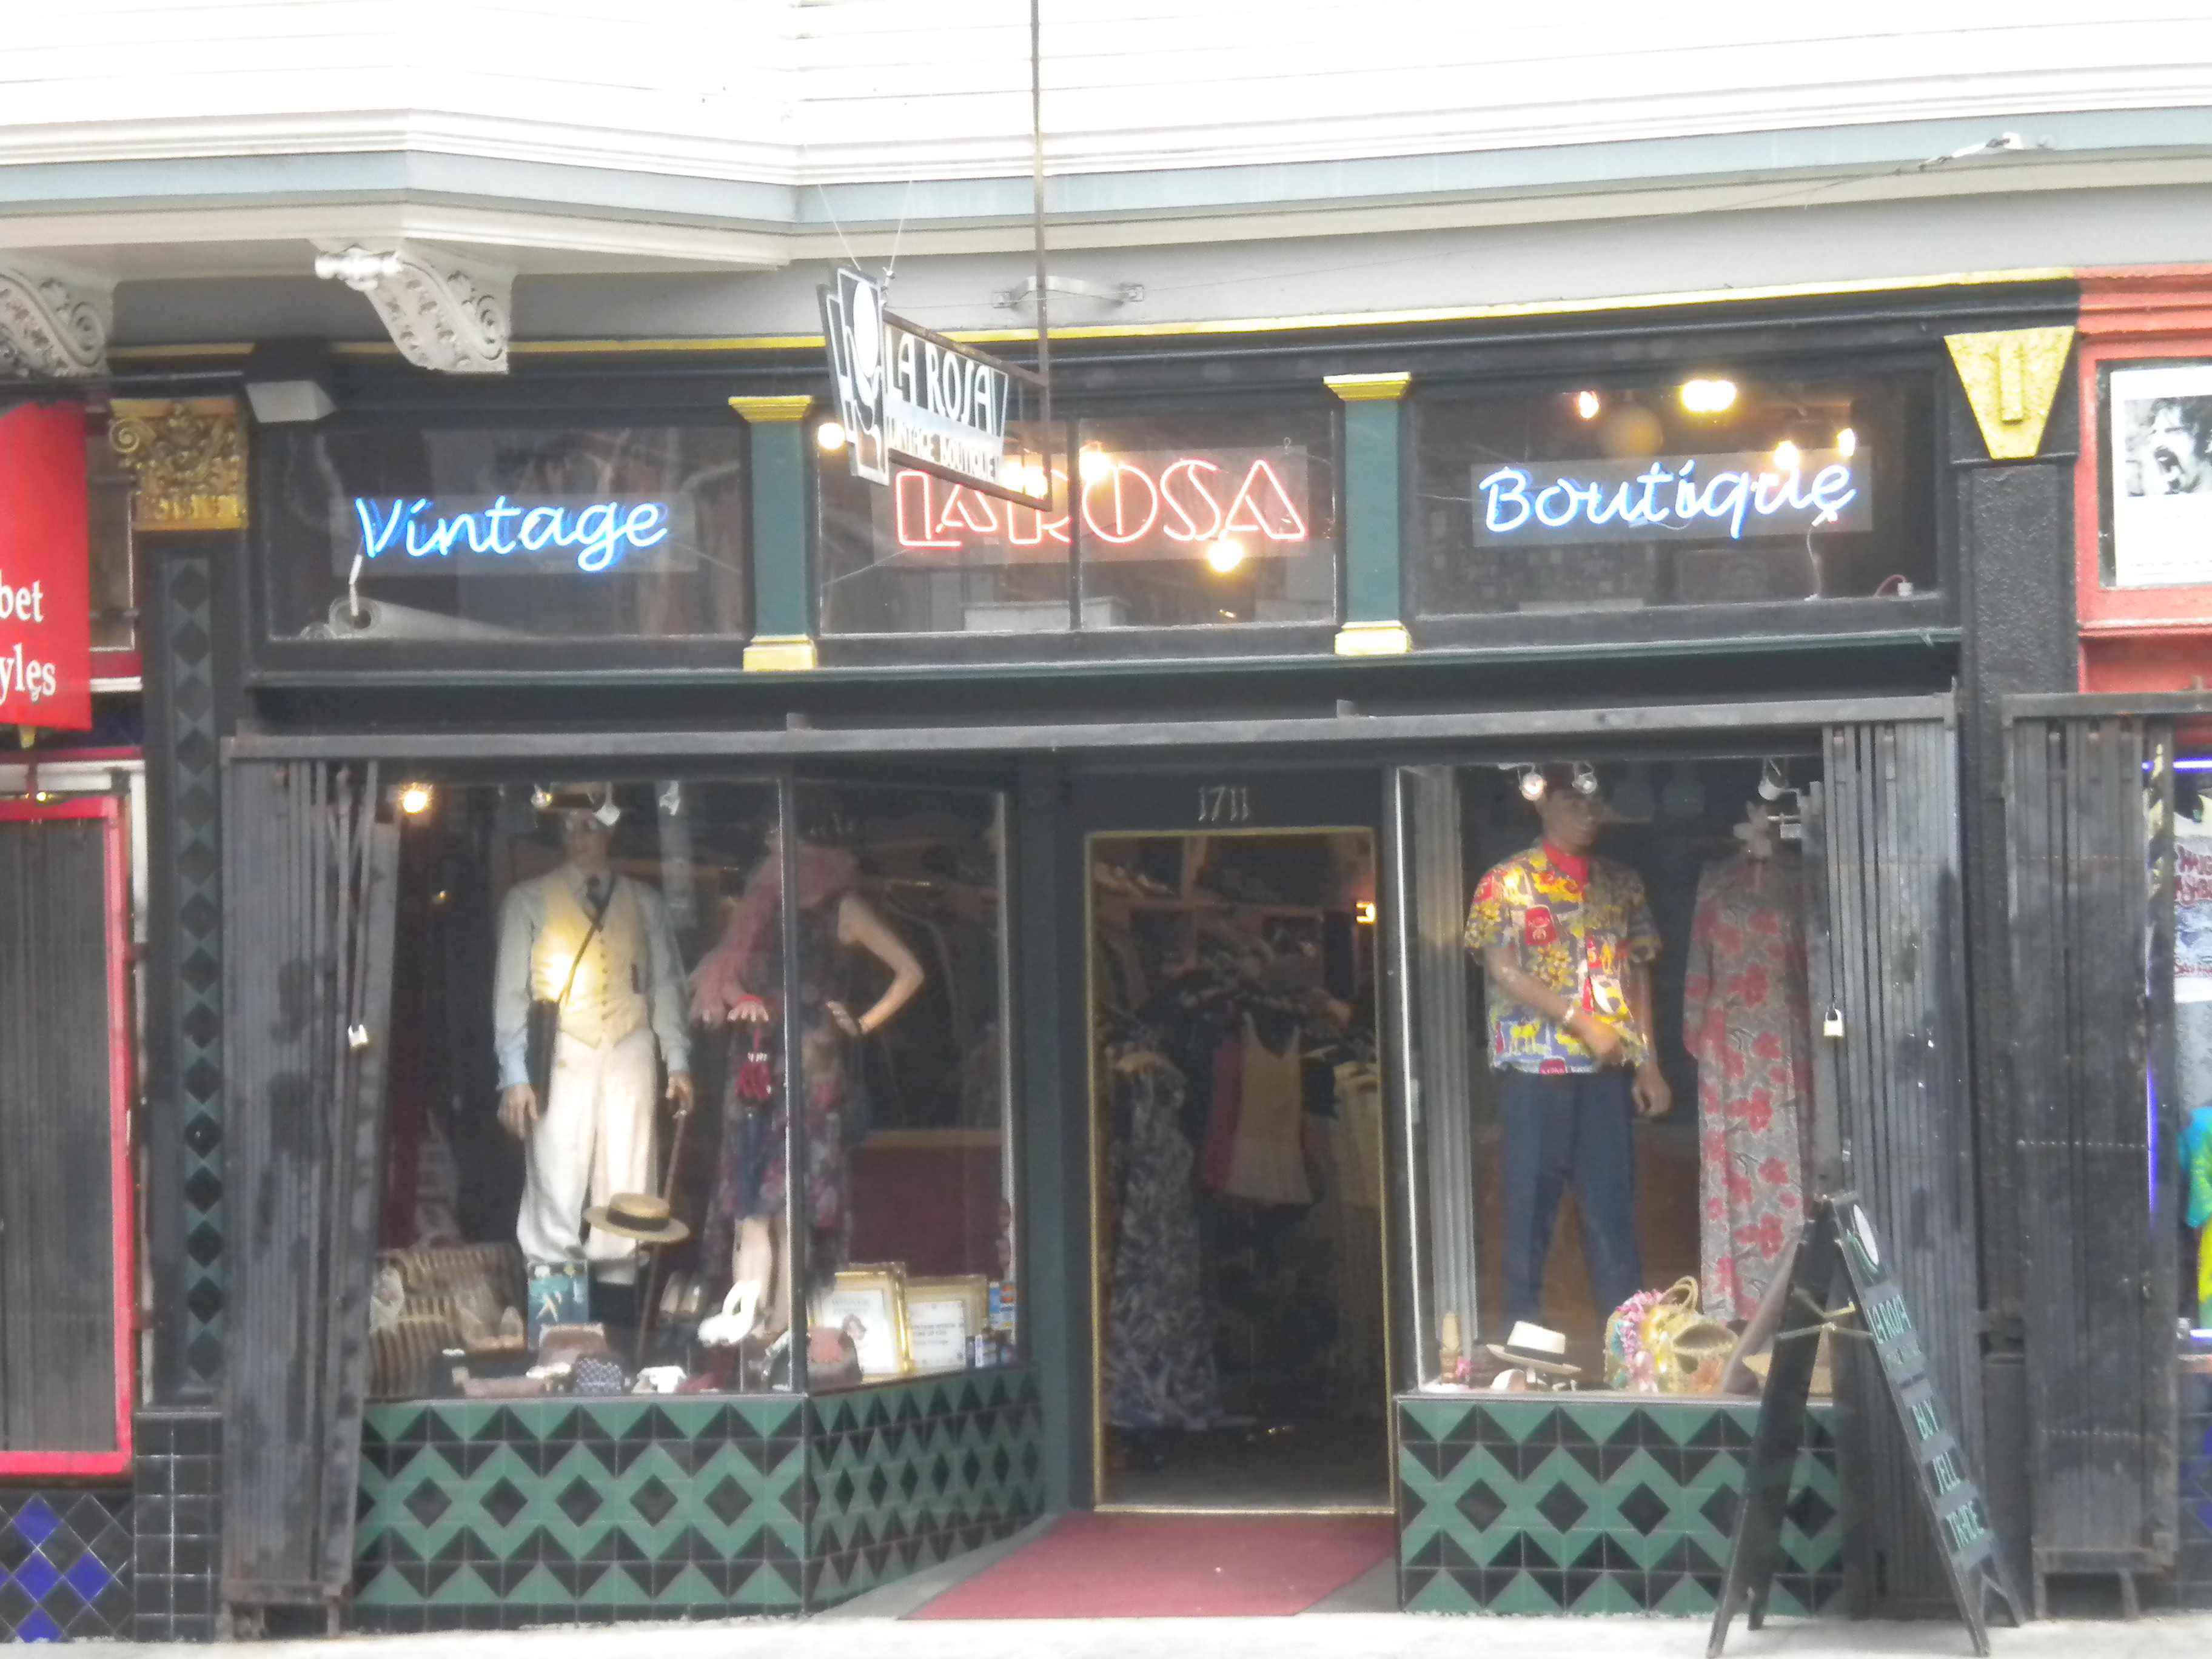 SAN DIEGO PADRES VINTAGE TEAM 9TWENTY - tienda